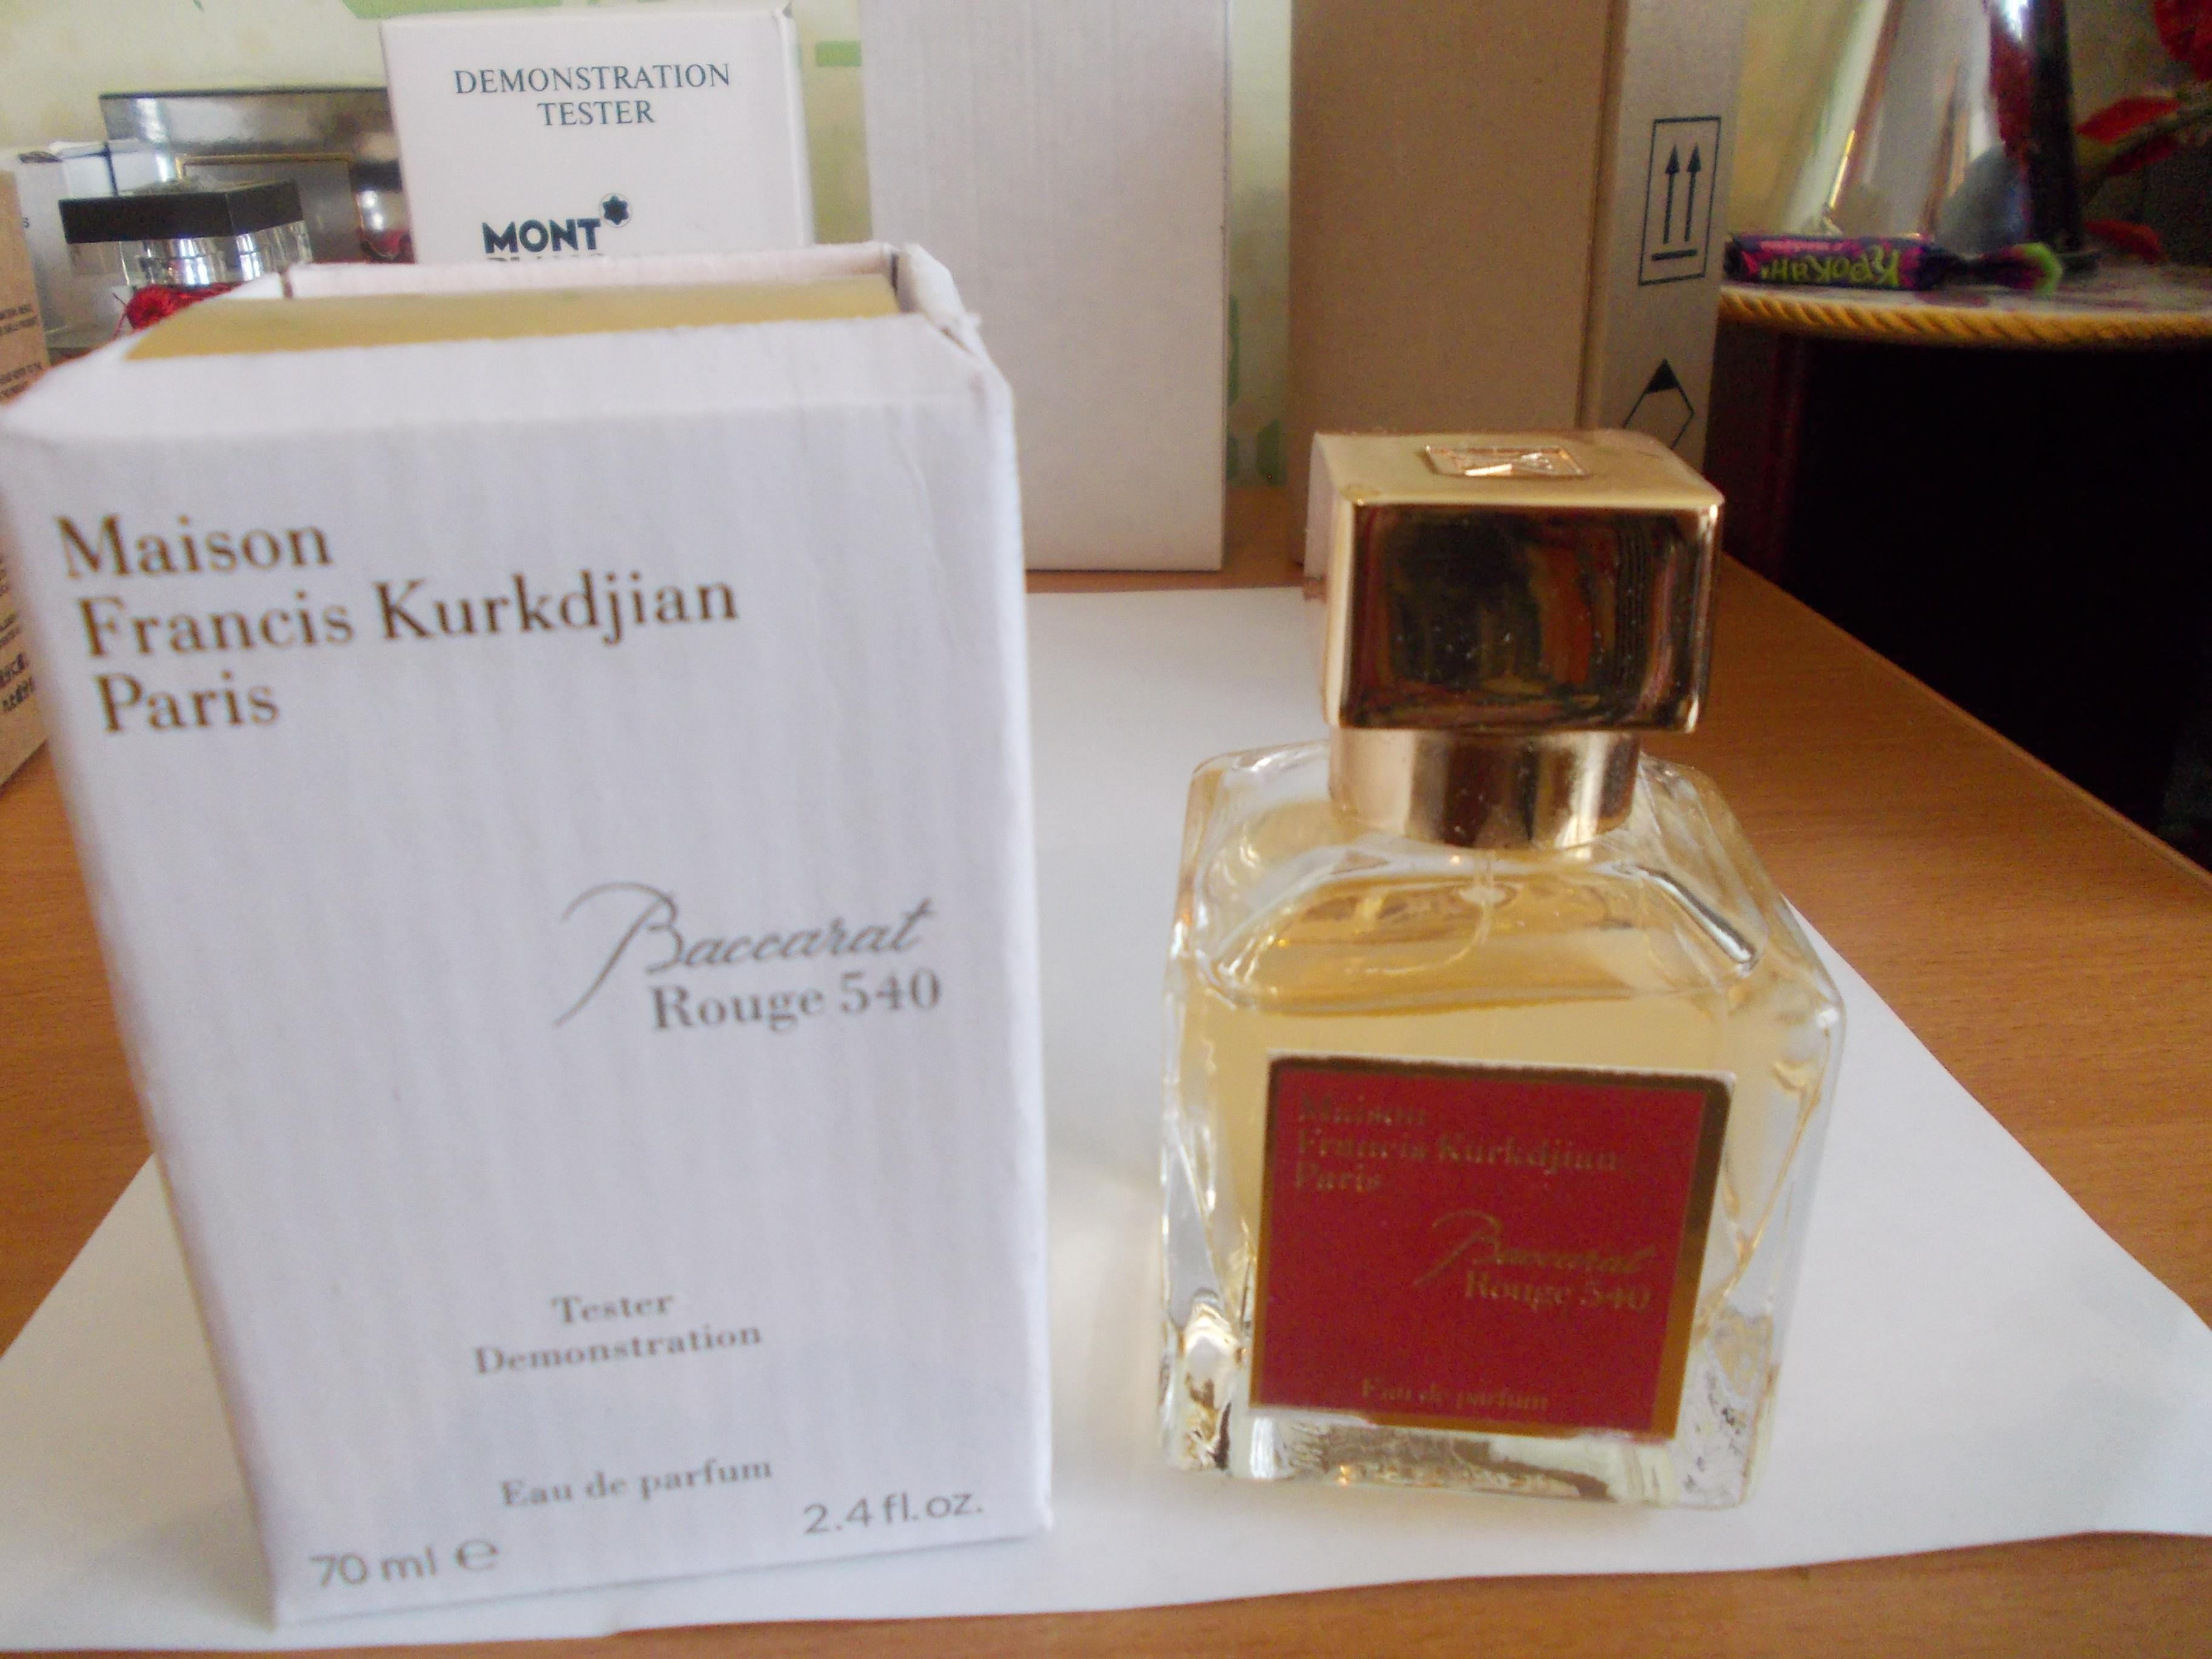 Baccarat Rouge 540 Maison Francis Kurkdjian парфюмерия в красноярске